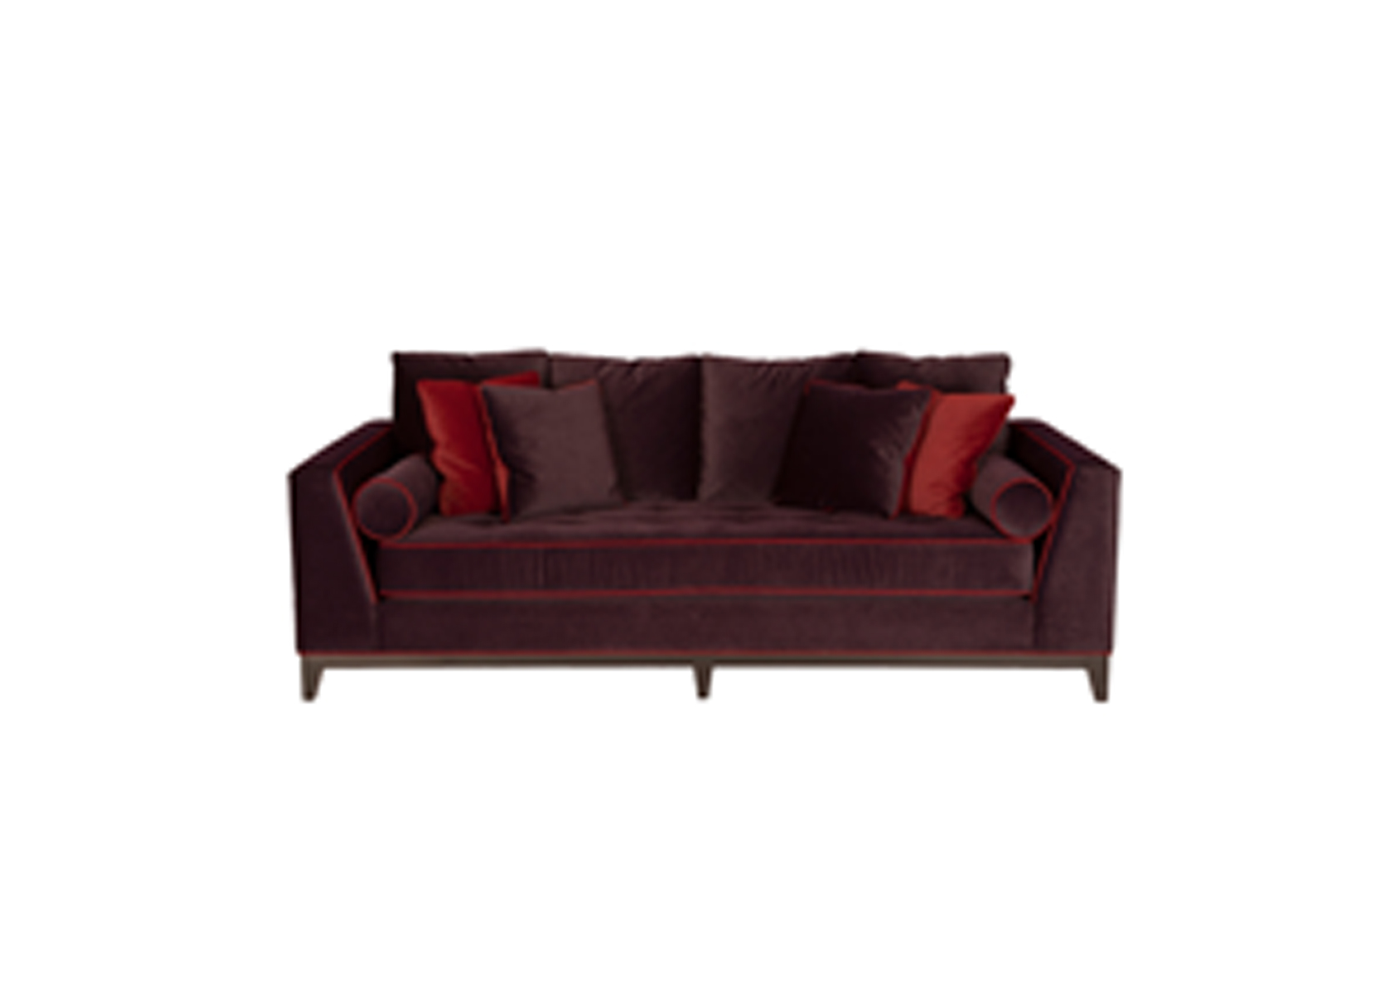 Polanco furniture store ottawa interior decor solutions for Amadeus decoration